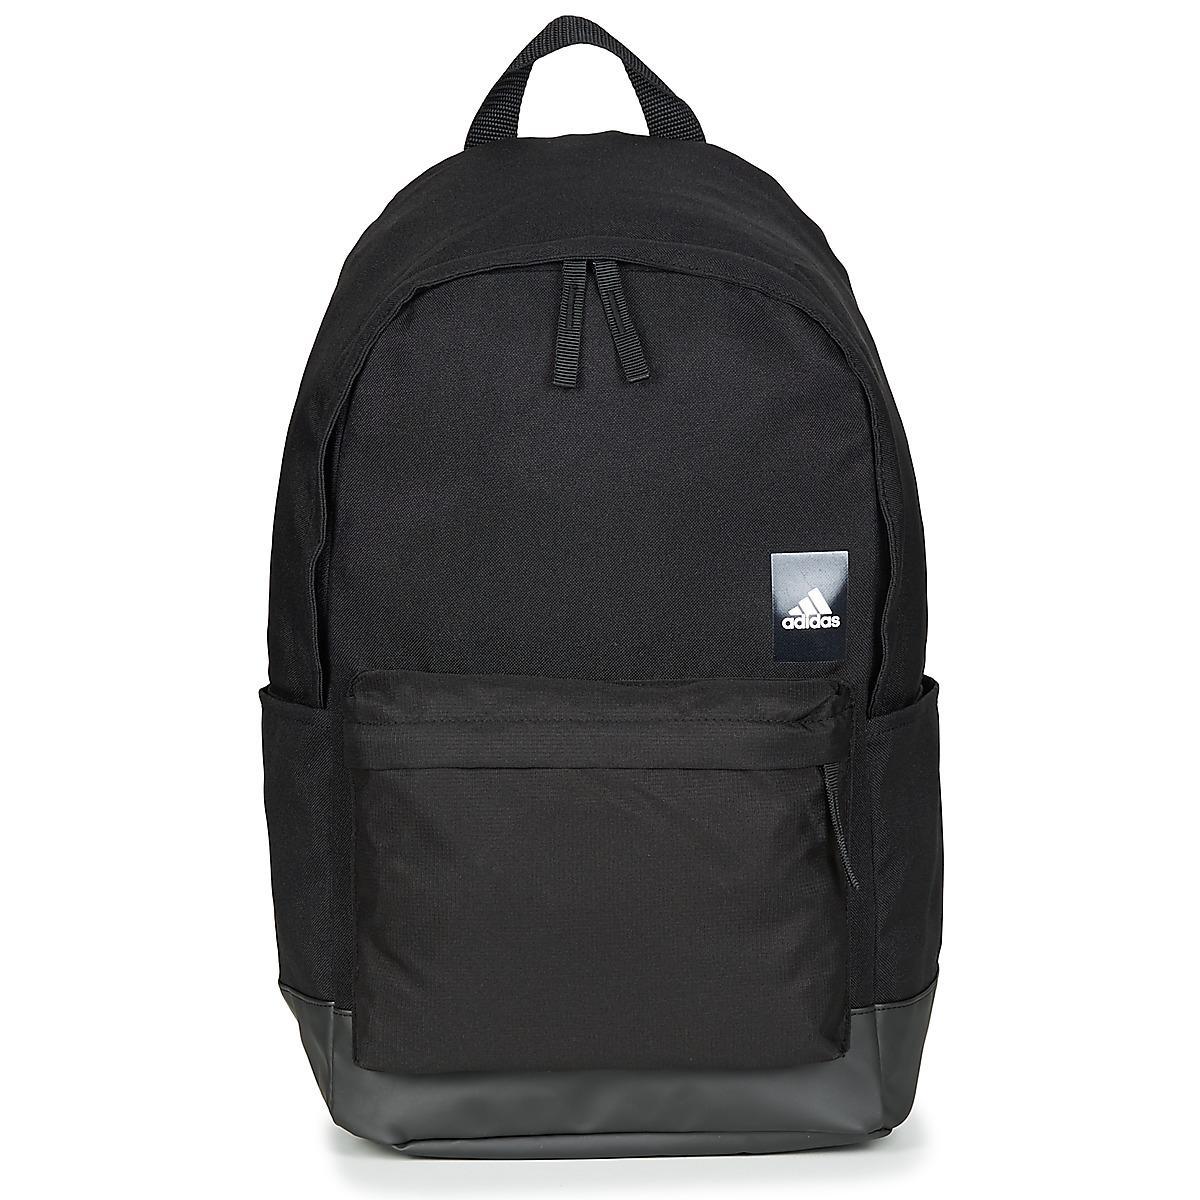 19c5708fdae adidas Classic Bp Women s Backpack In Black in Black for Men - Lyst